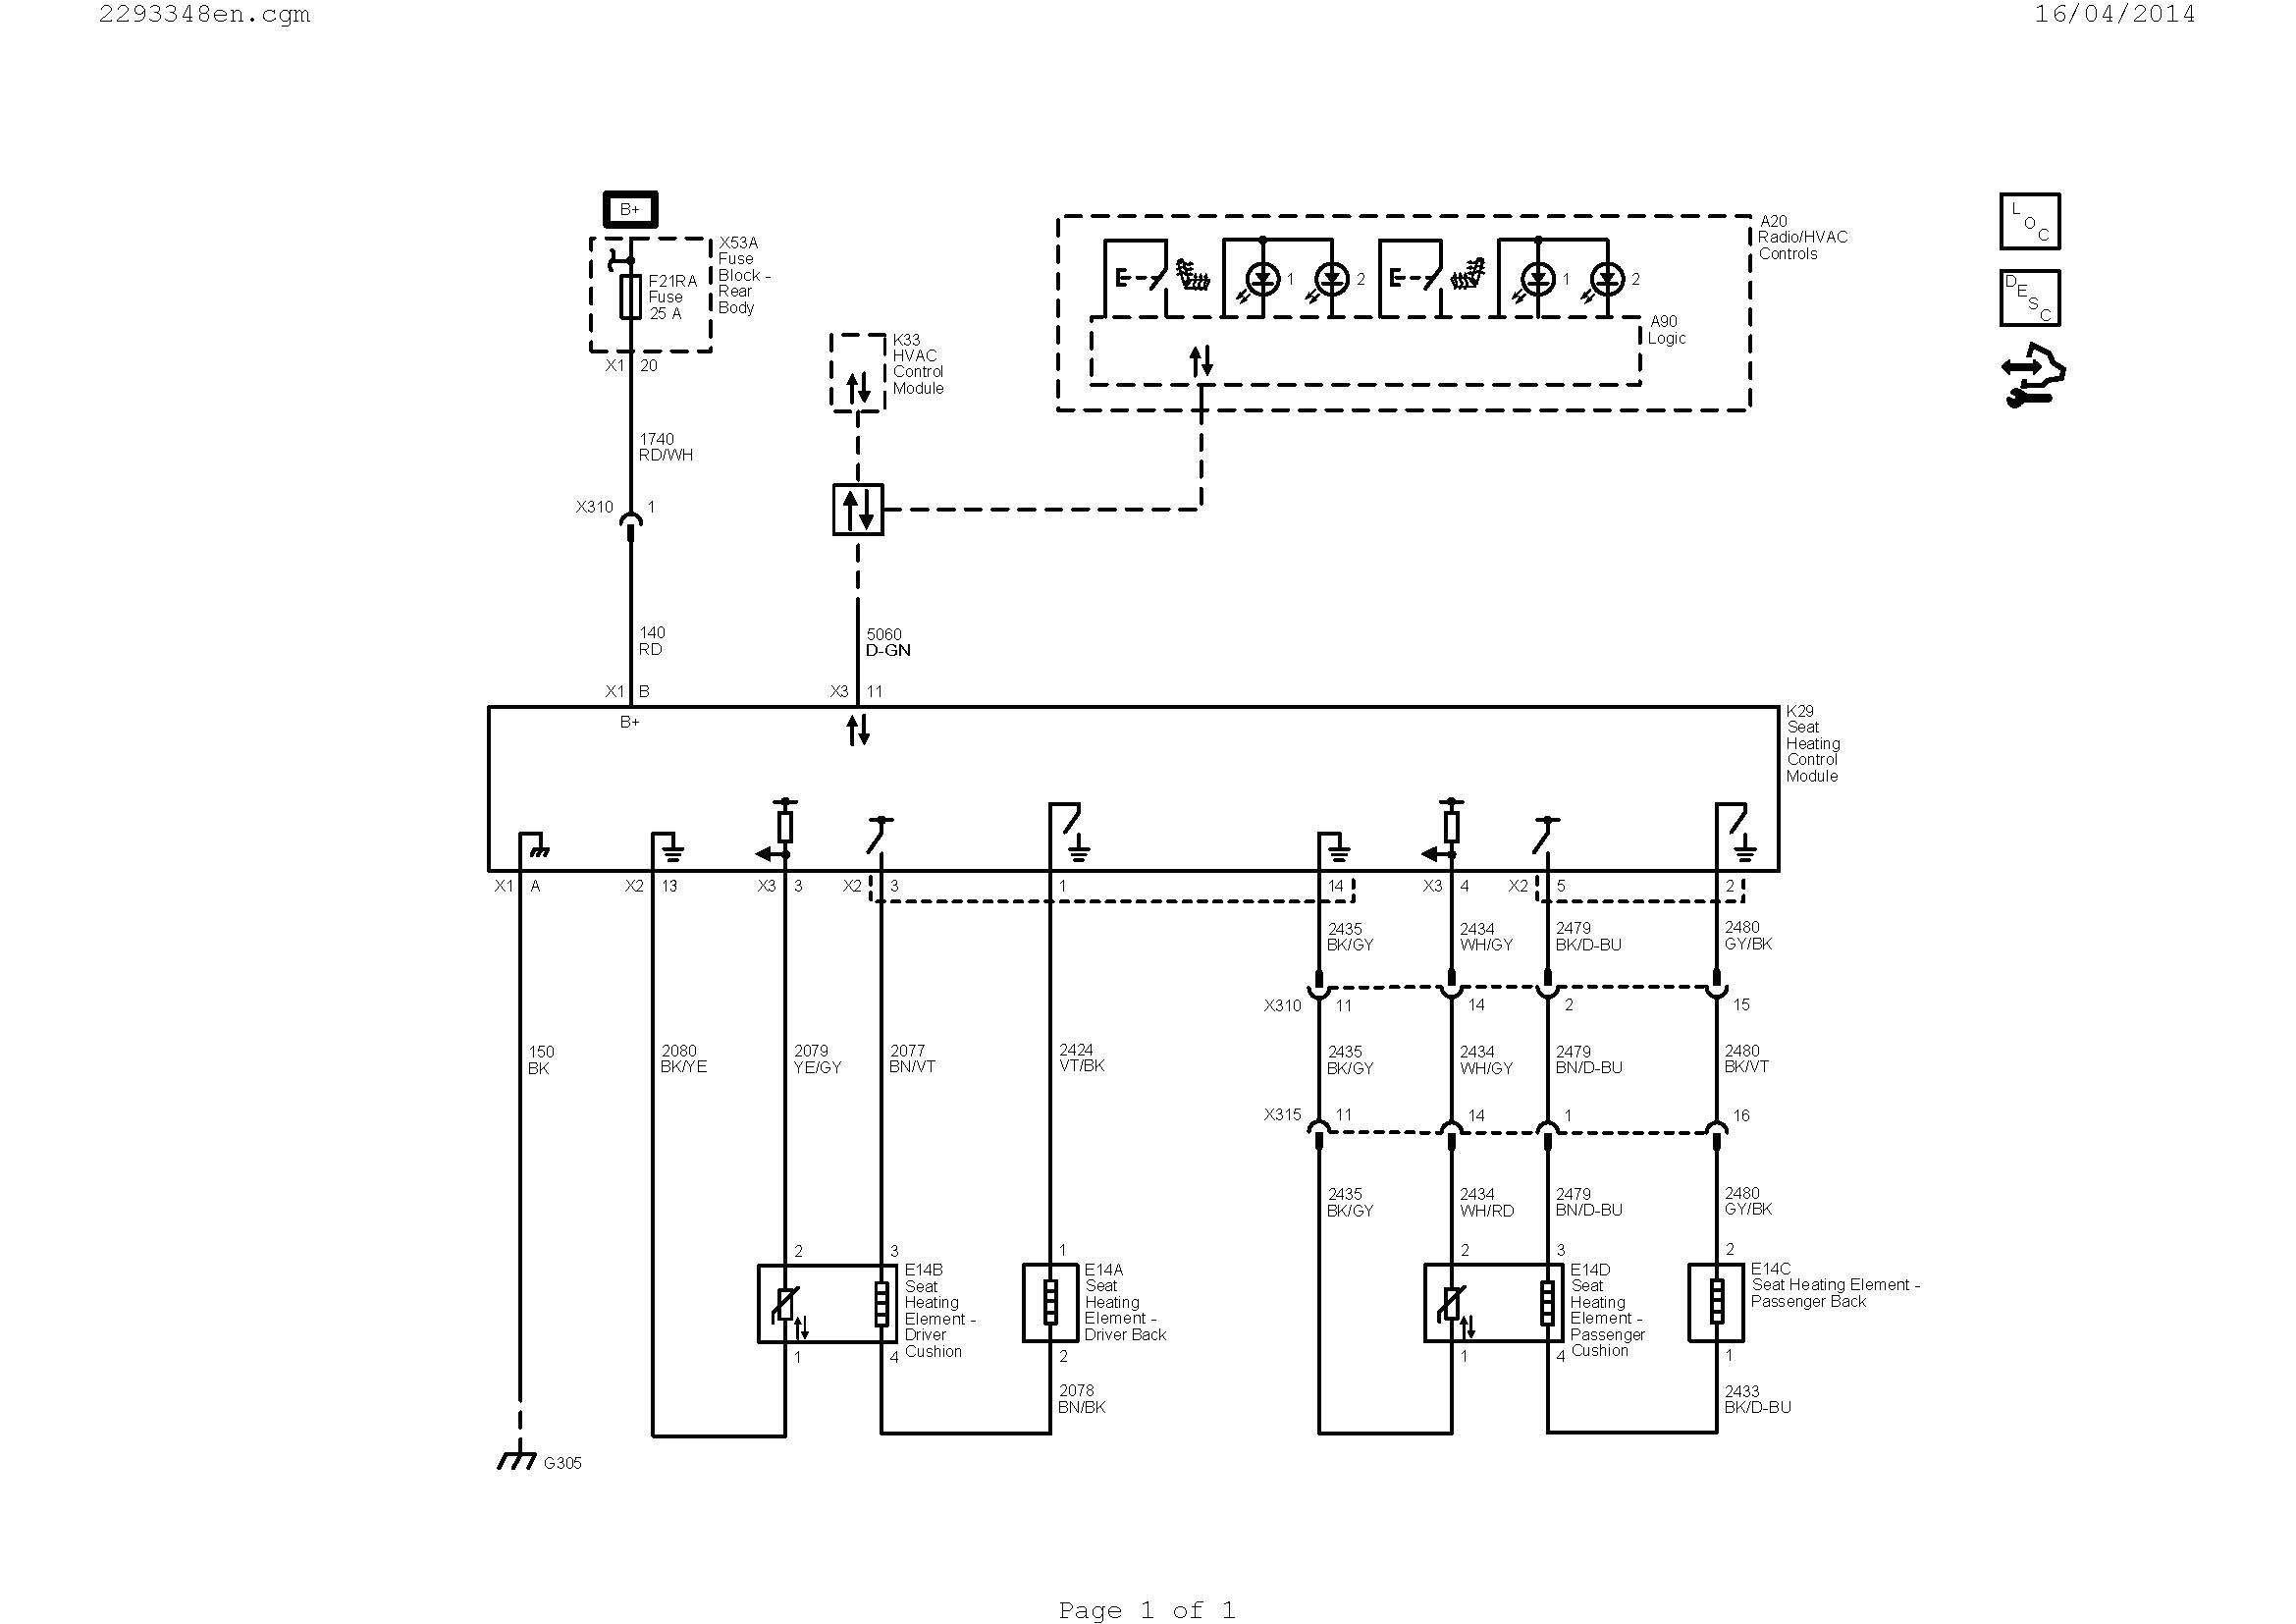 jugs pitching machine wiring diagram unique glow relay wiring diagram new 2004 2010 bmw x3 3 0d e83 m57 glow